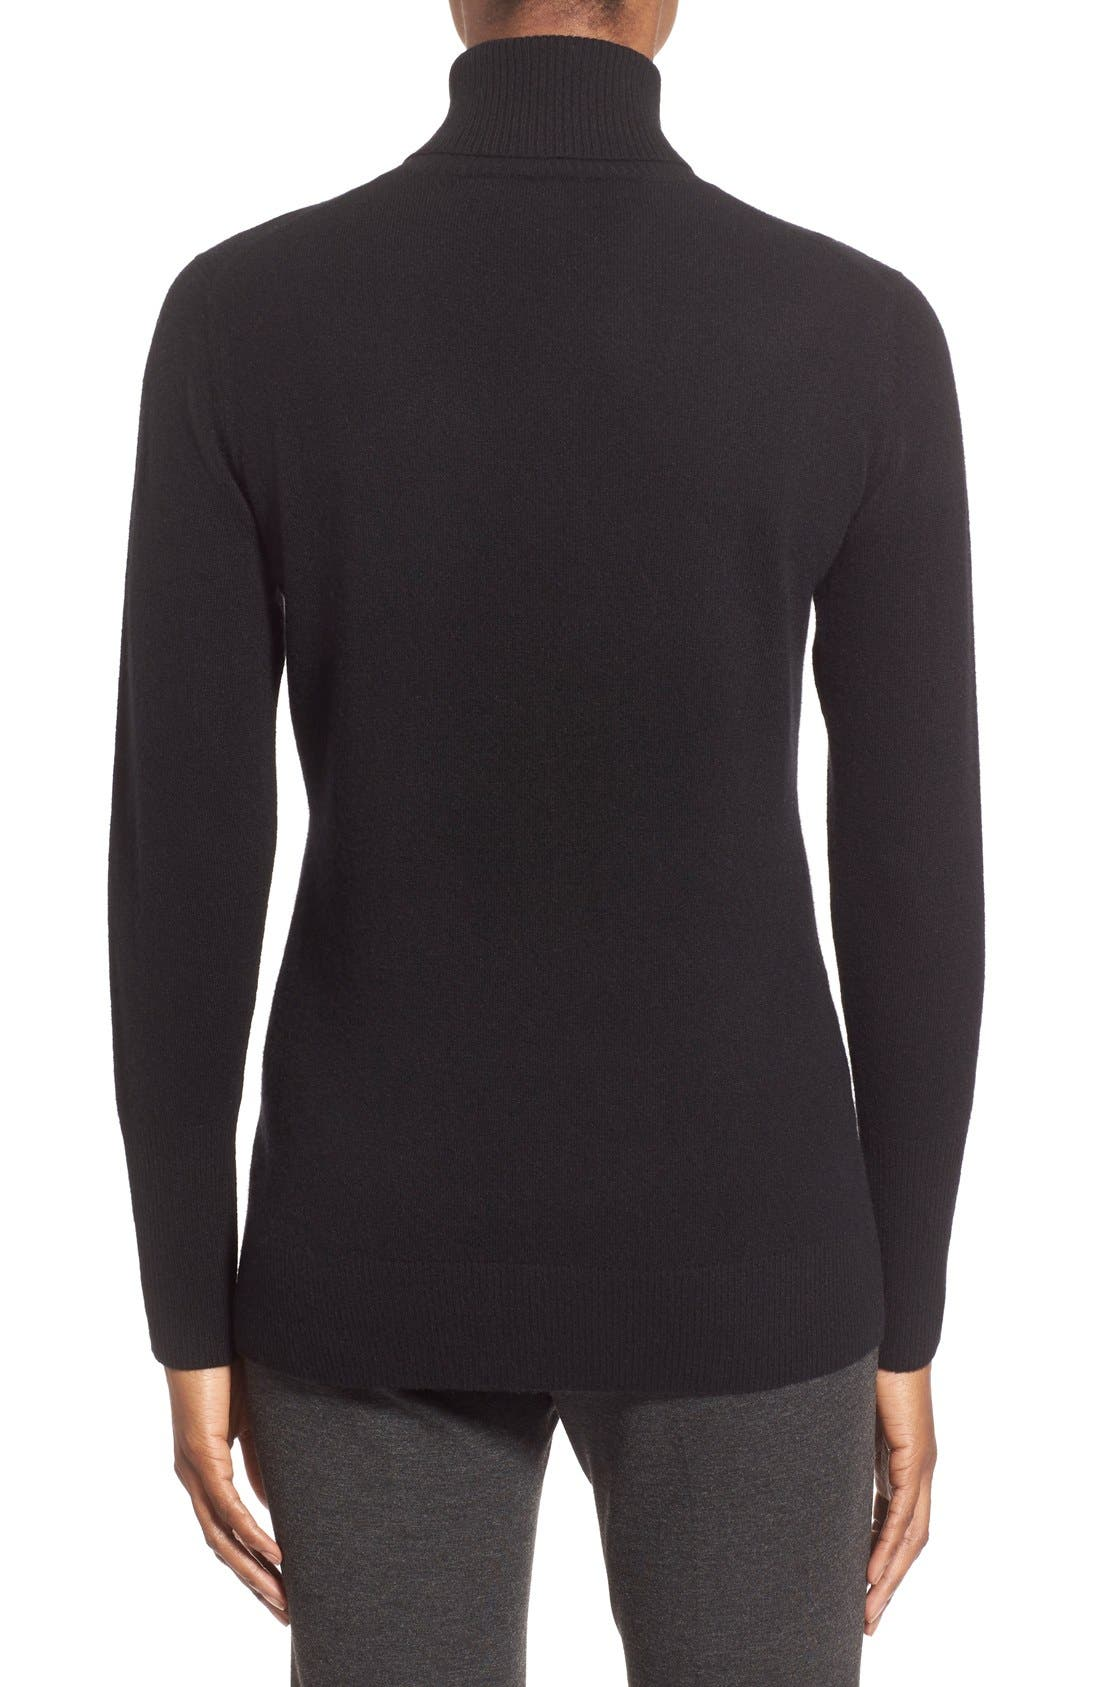 NORDSTROM COLLECTION,                             Cashmere Turtleneck Sweater,                             Alternate thumbnail 4, color,                             001